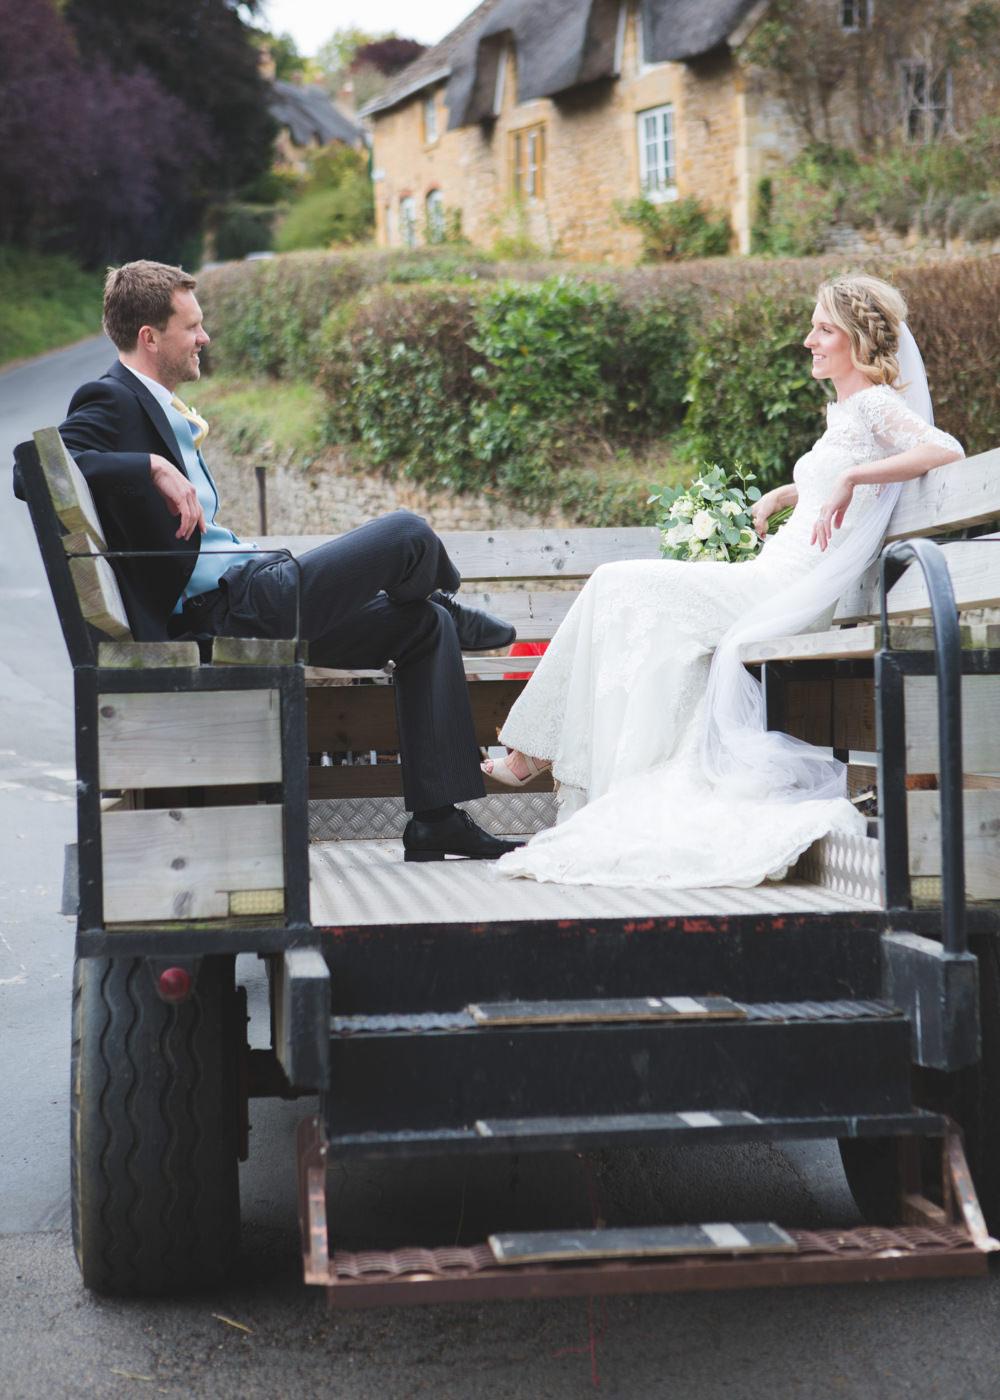 Tractor Trailer Transport Airbnb Wedding Pickavance Weddings